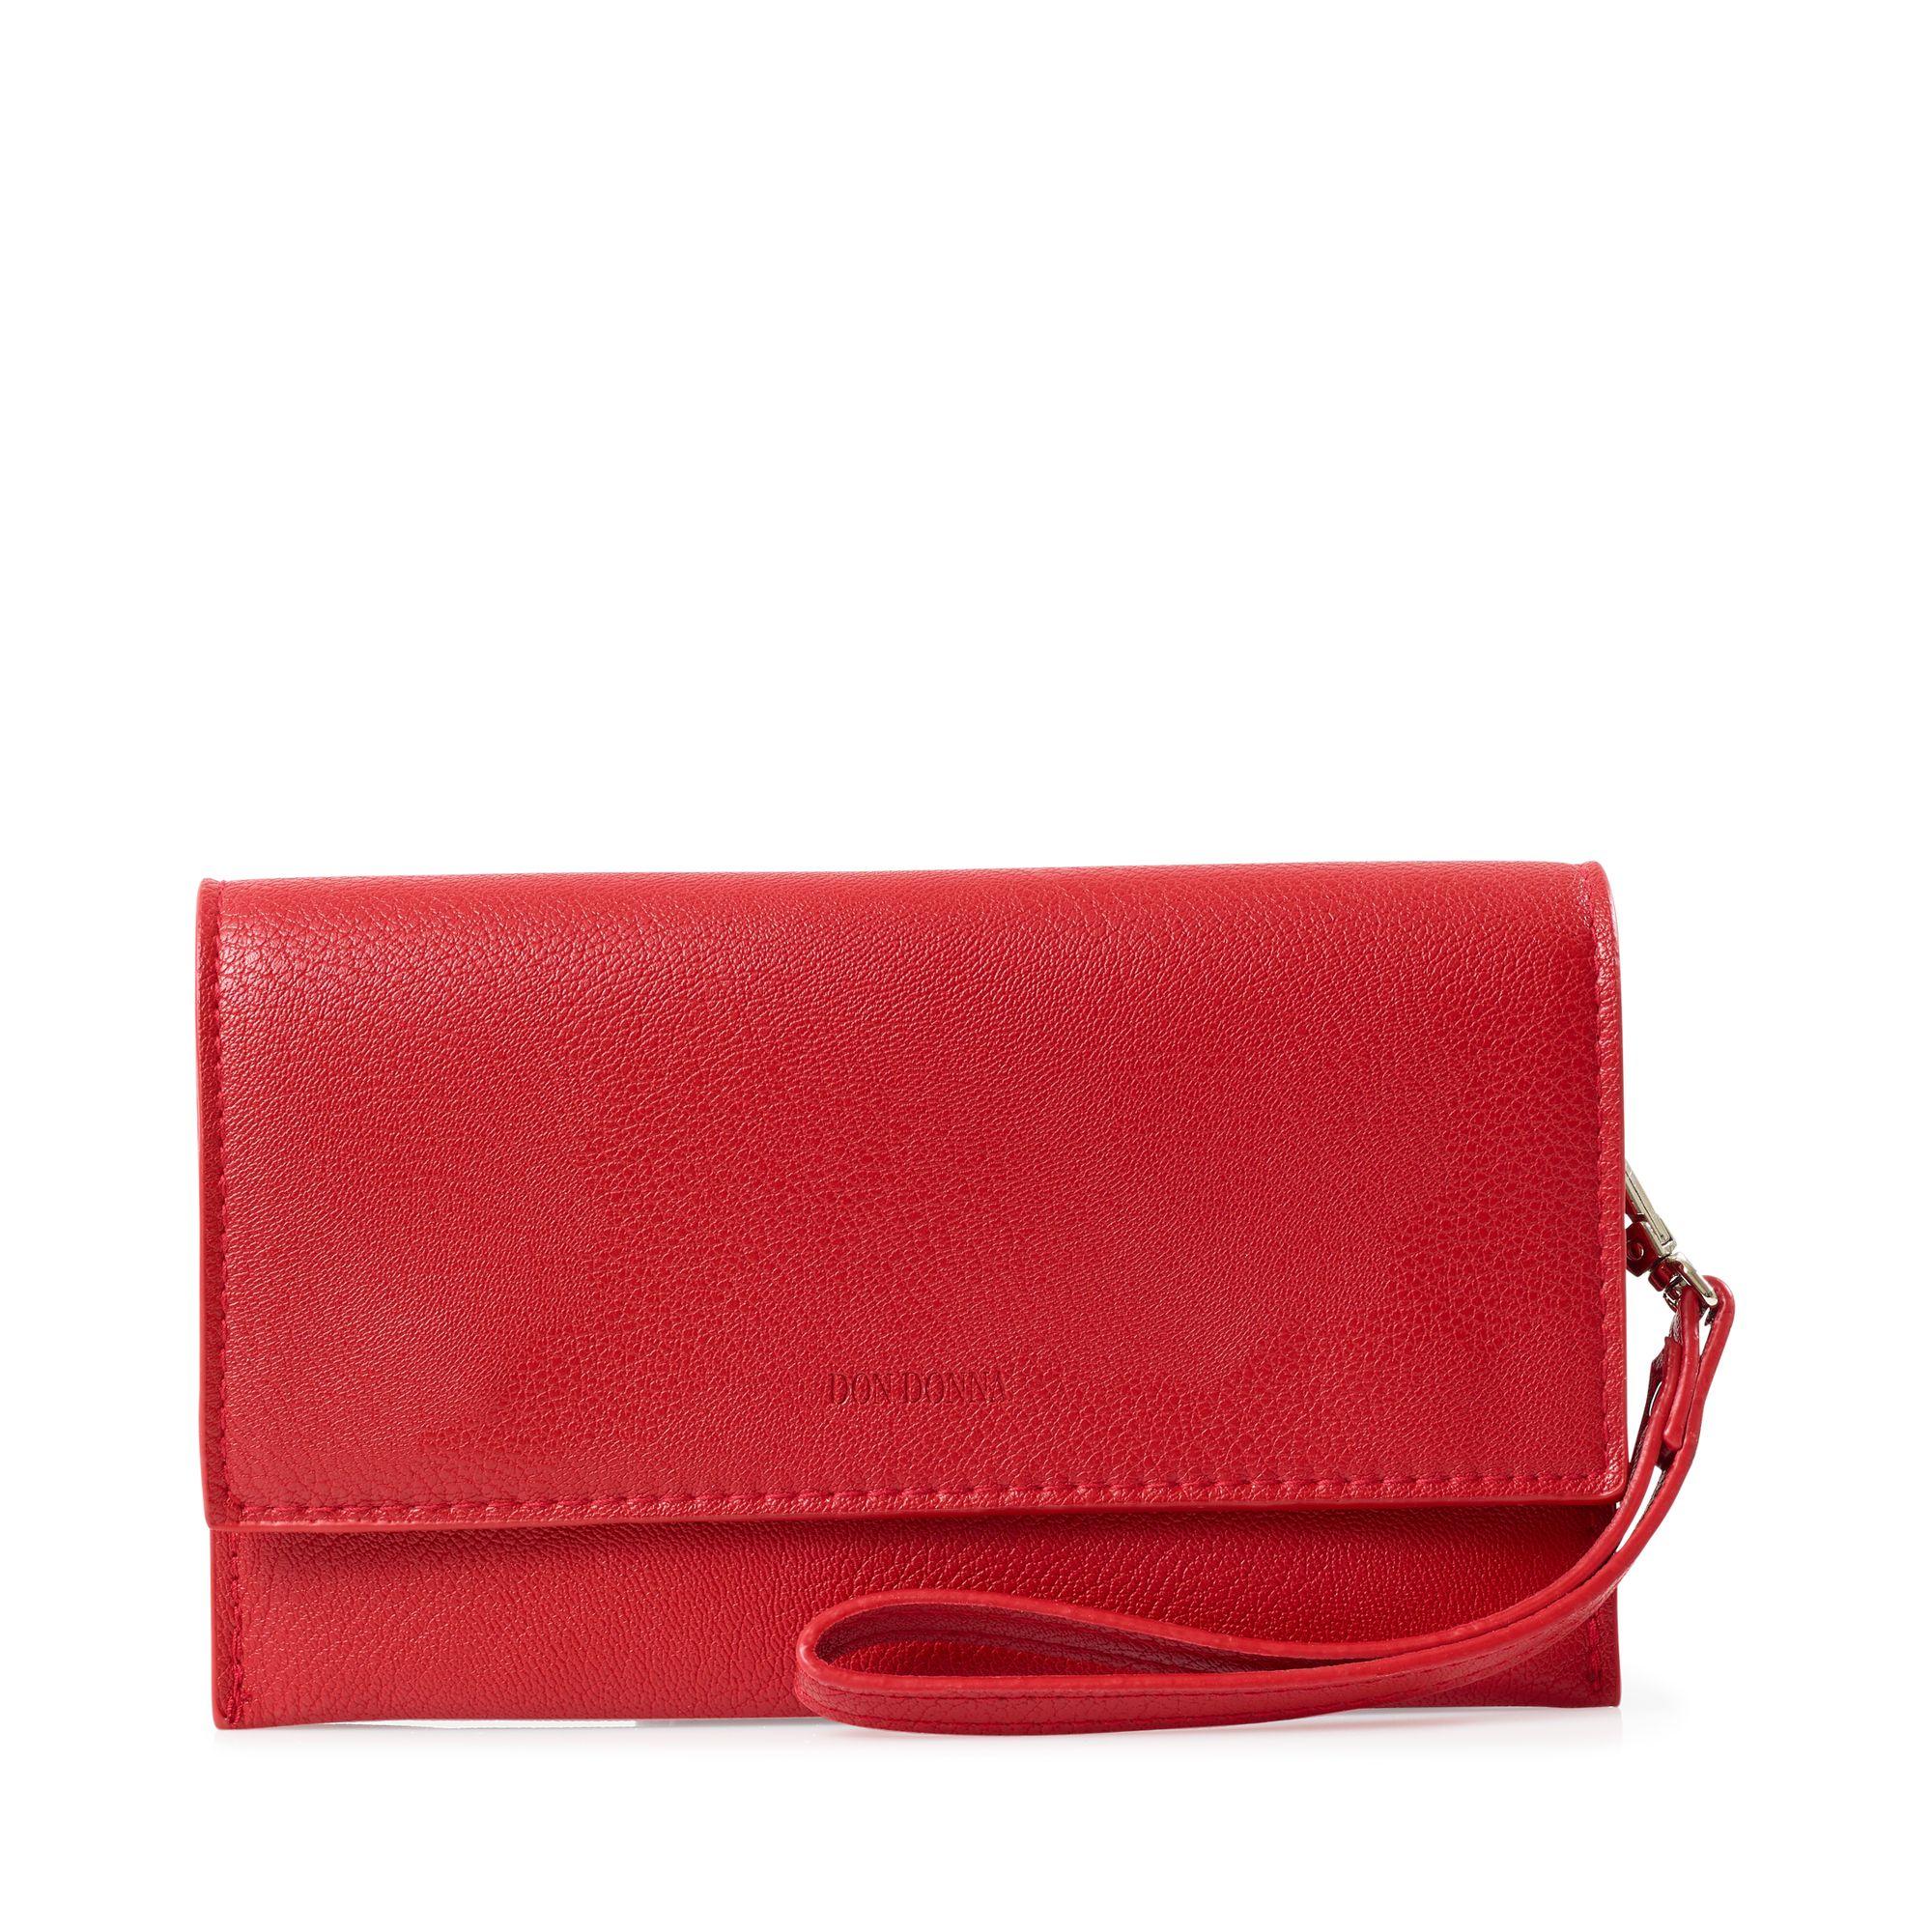 Don Donna Amy liten kuvertväska, Röd